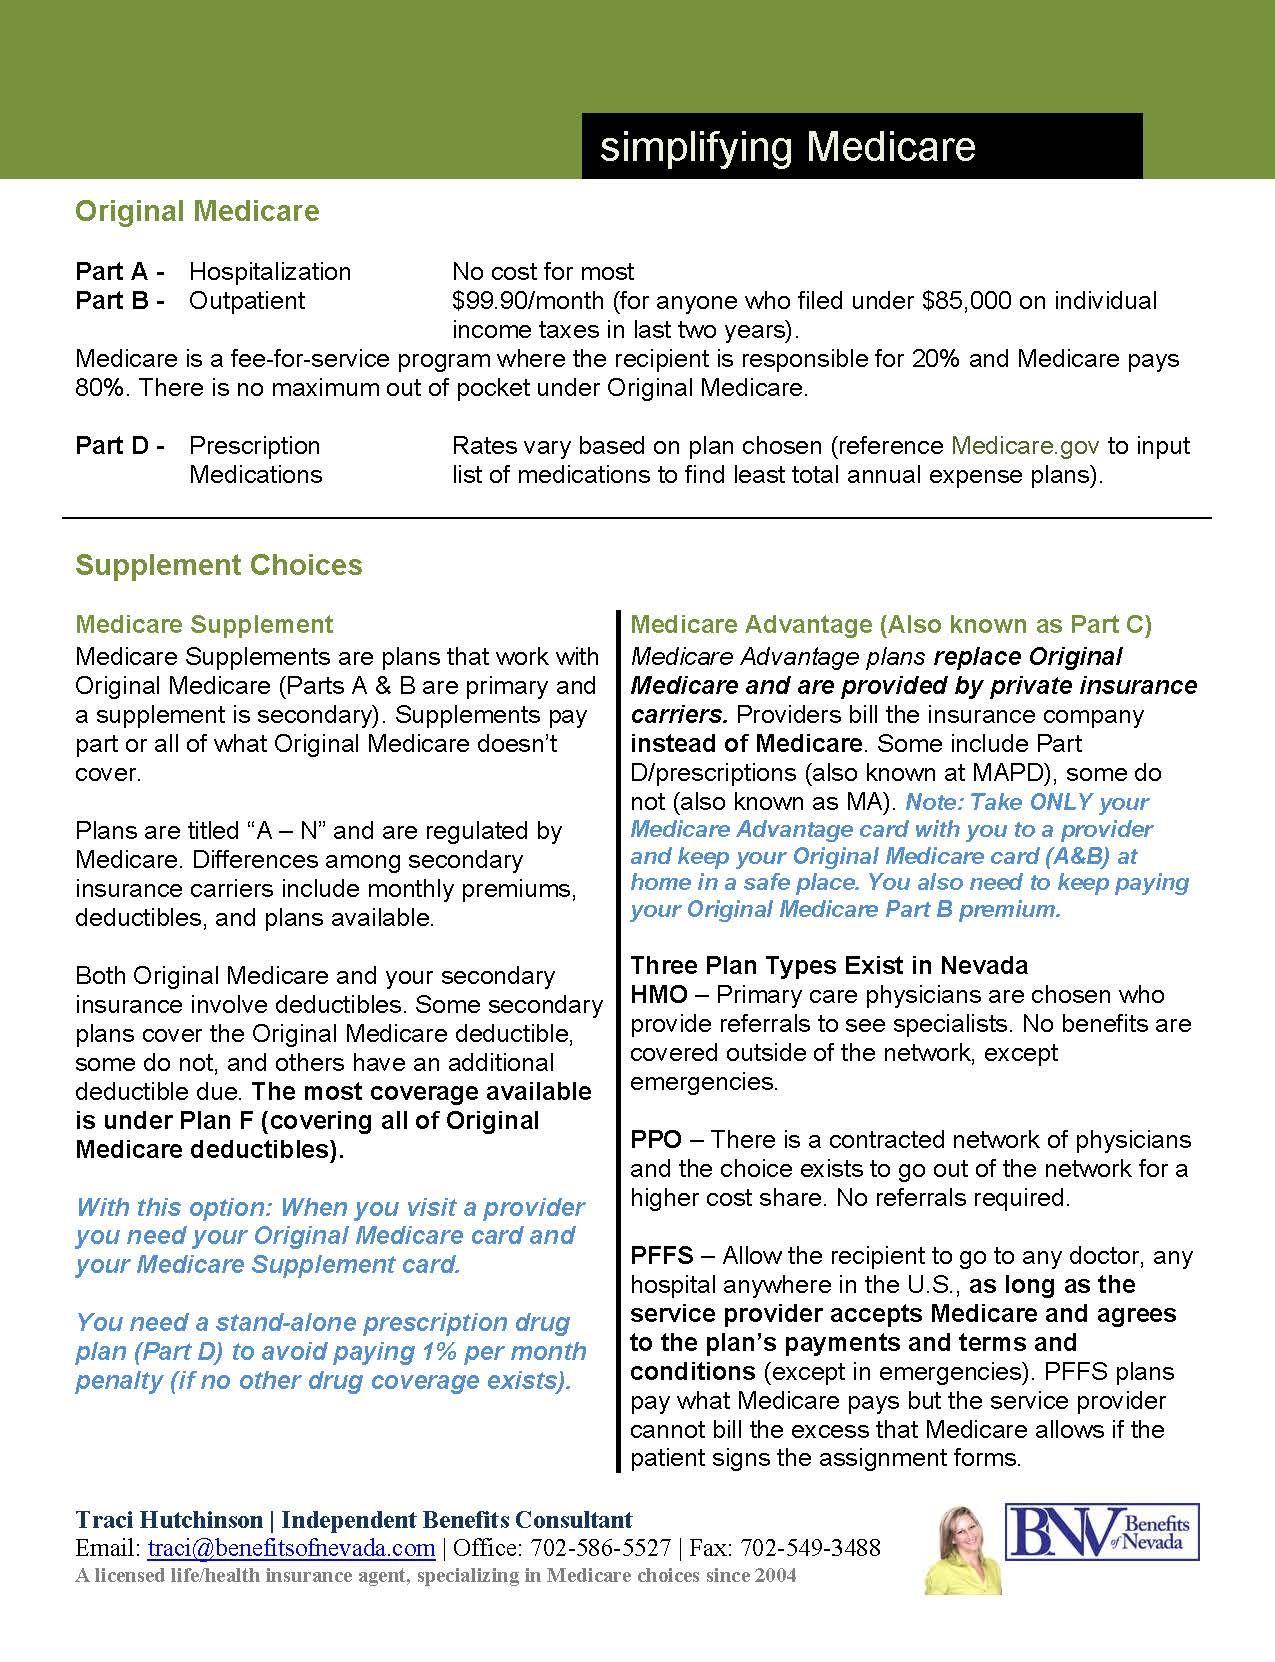 Medicare Vs Medicaid Medicaid Medicare Medicare Supplement